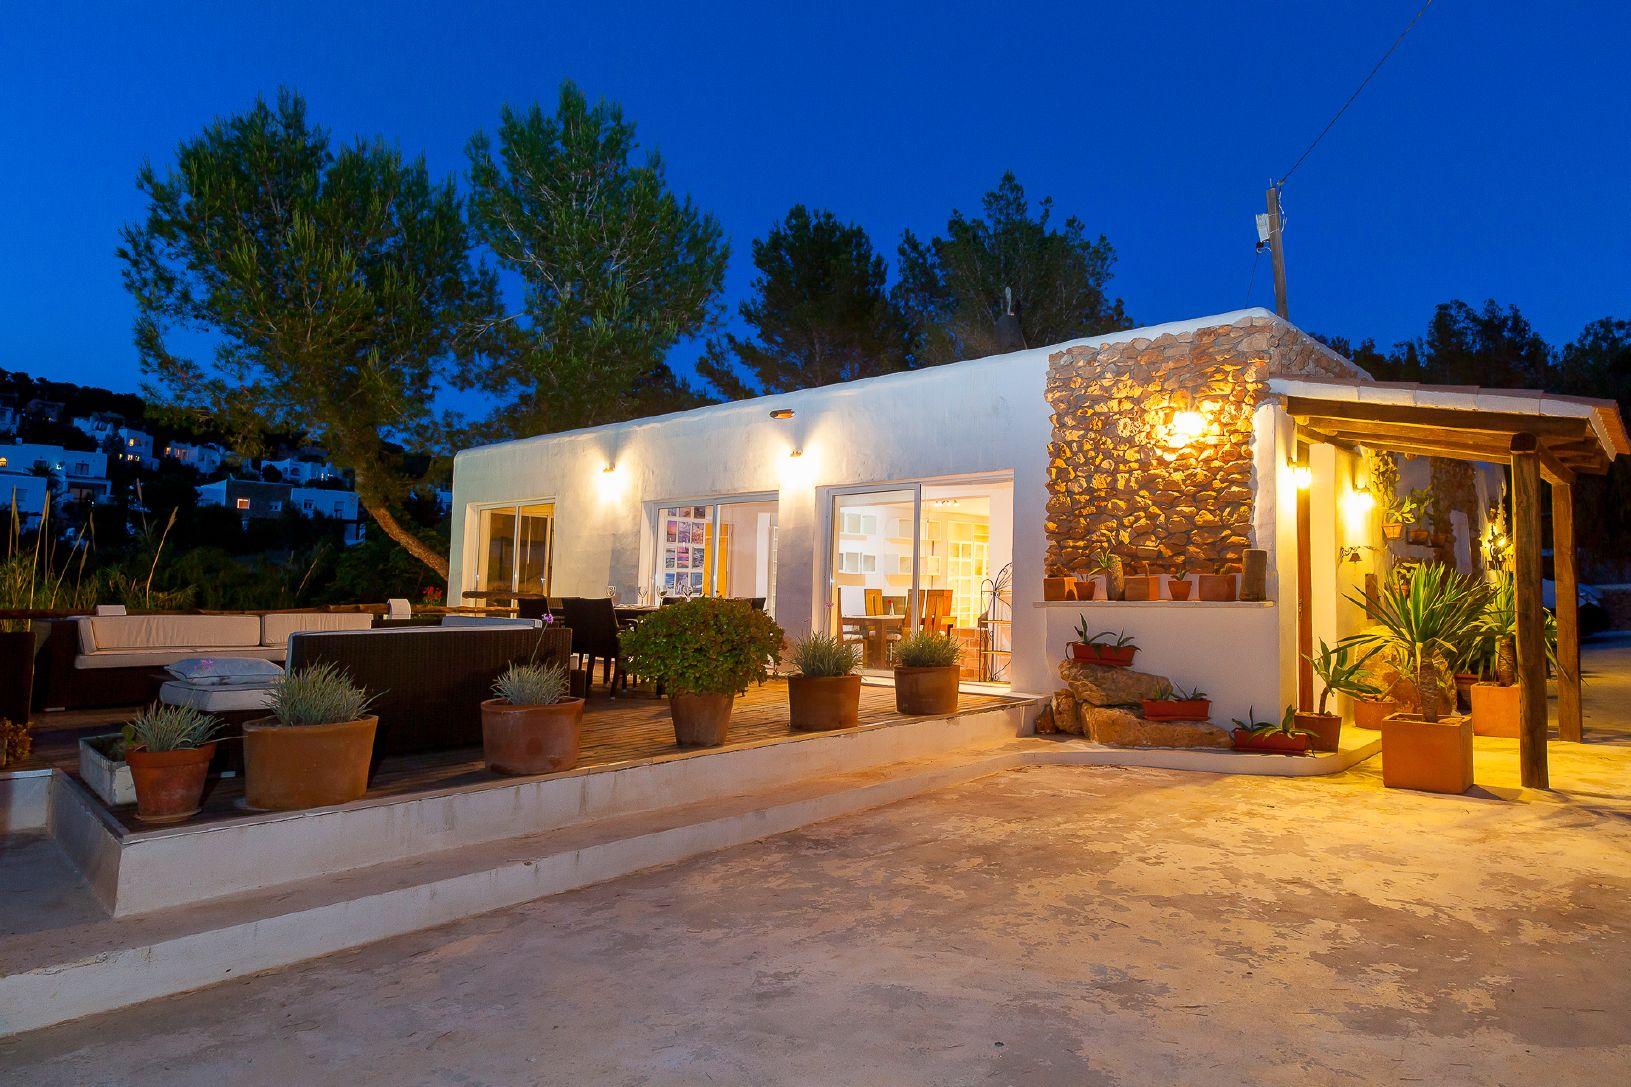 Alquiler de casa rural con piscina en ibiza villa ves for Villa de casas